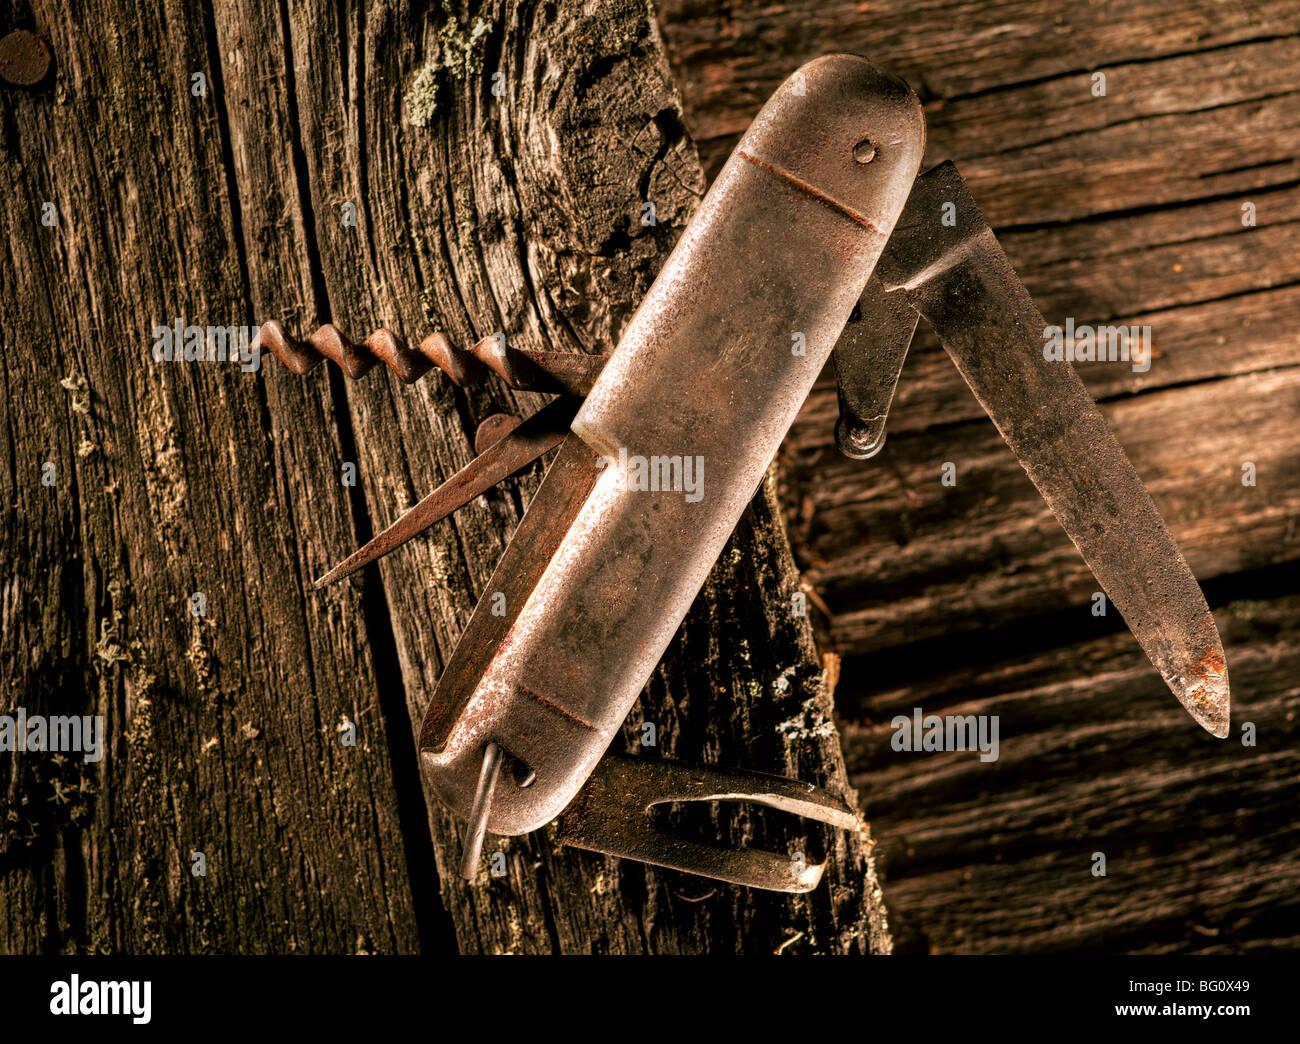 Rusty pocket knife - Stock Image